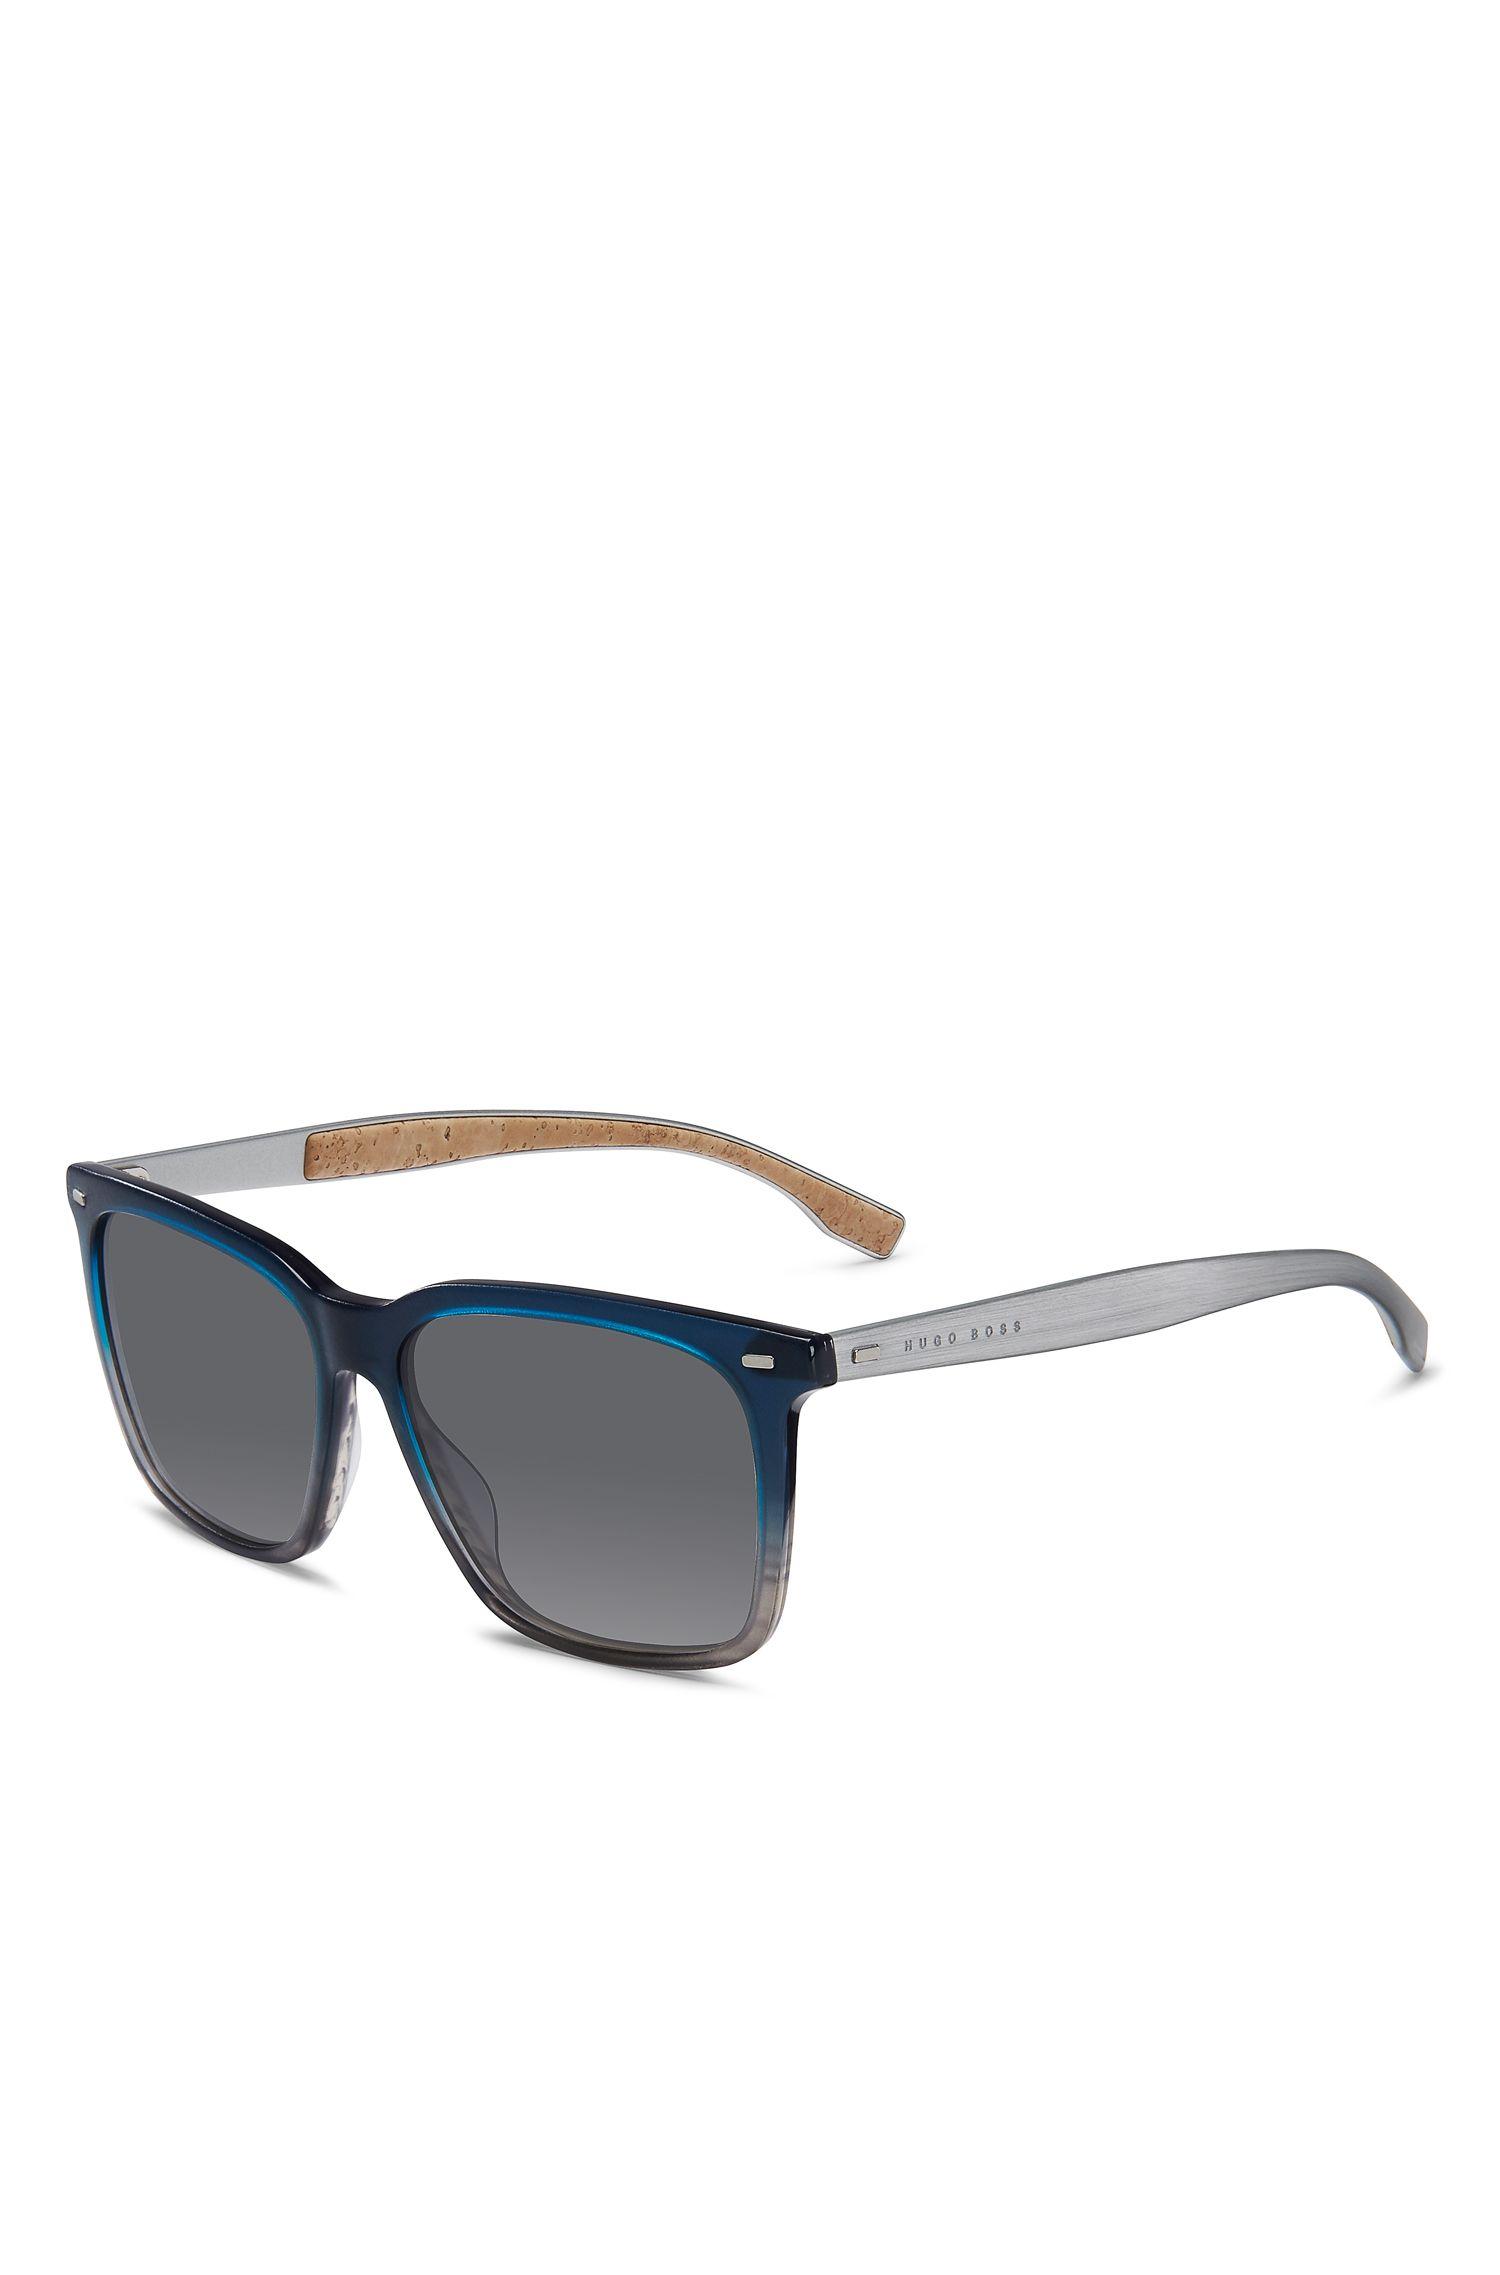 Grey Acetate Rectangular Sunglasses | BOSS 0883S